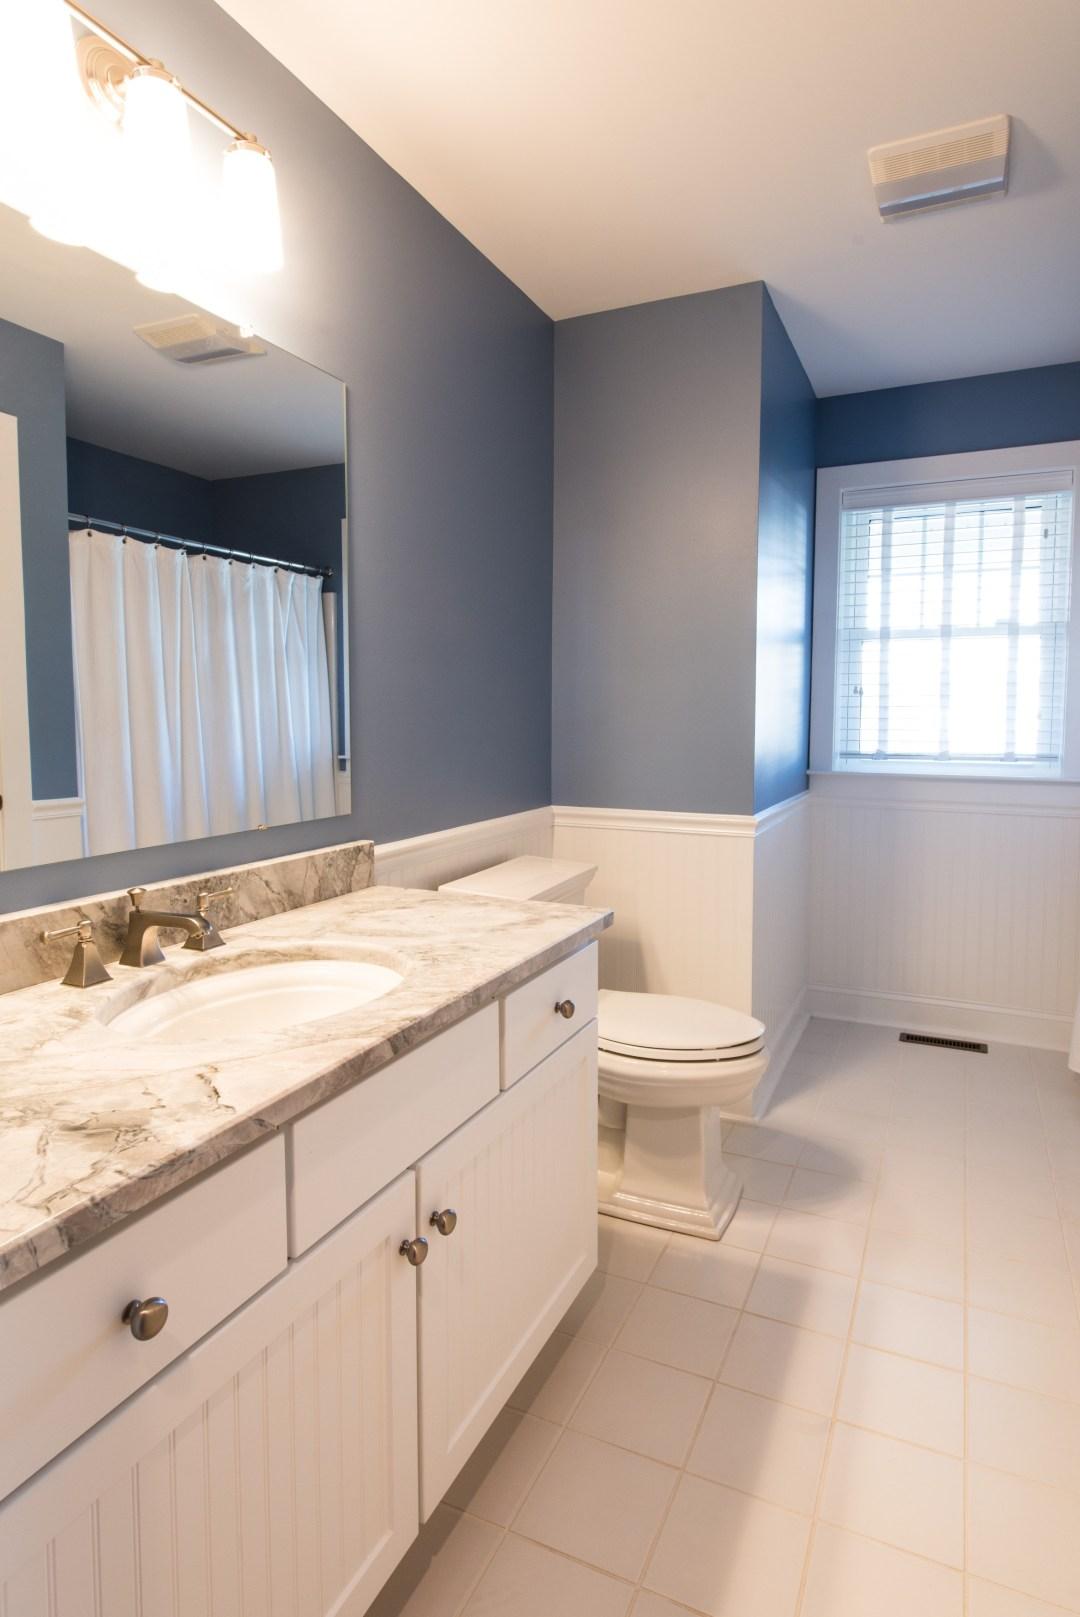 Bathroom Remodel in Ocean Ridge, Bethany Beach DE with White Floor Tiles, Memoirs Elongated Toilet and White Wood Vanity